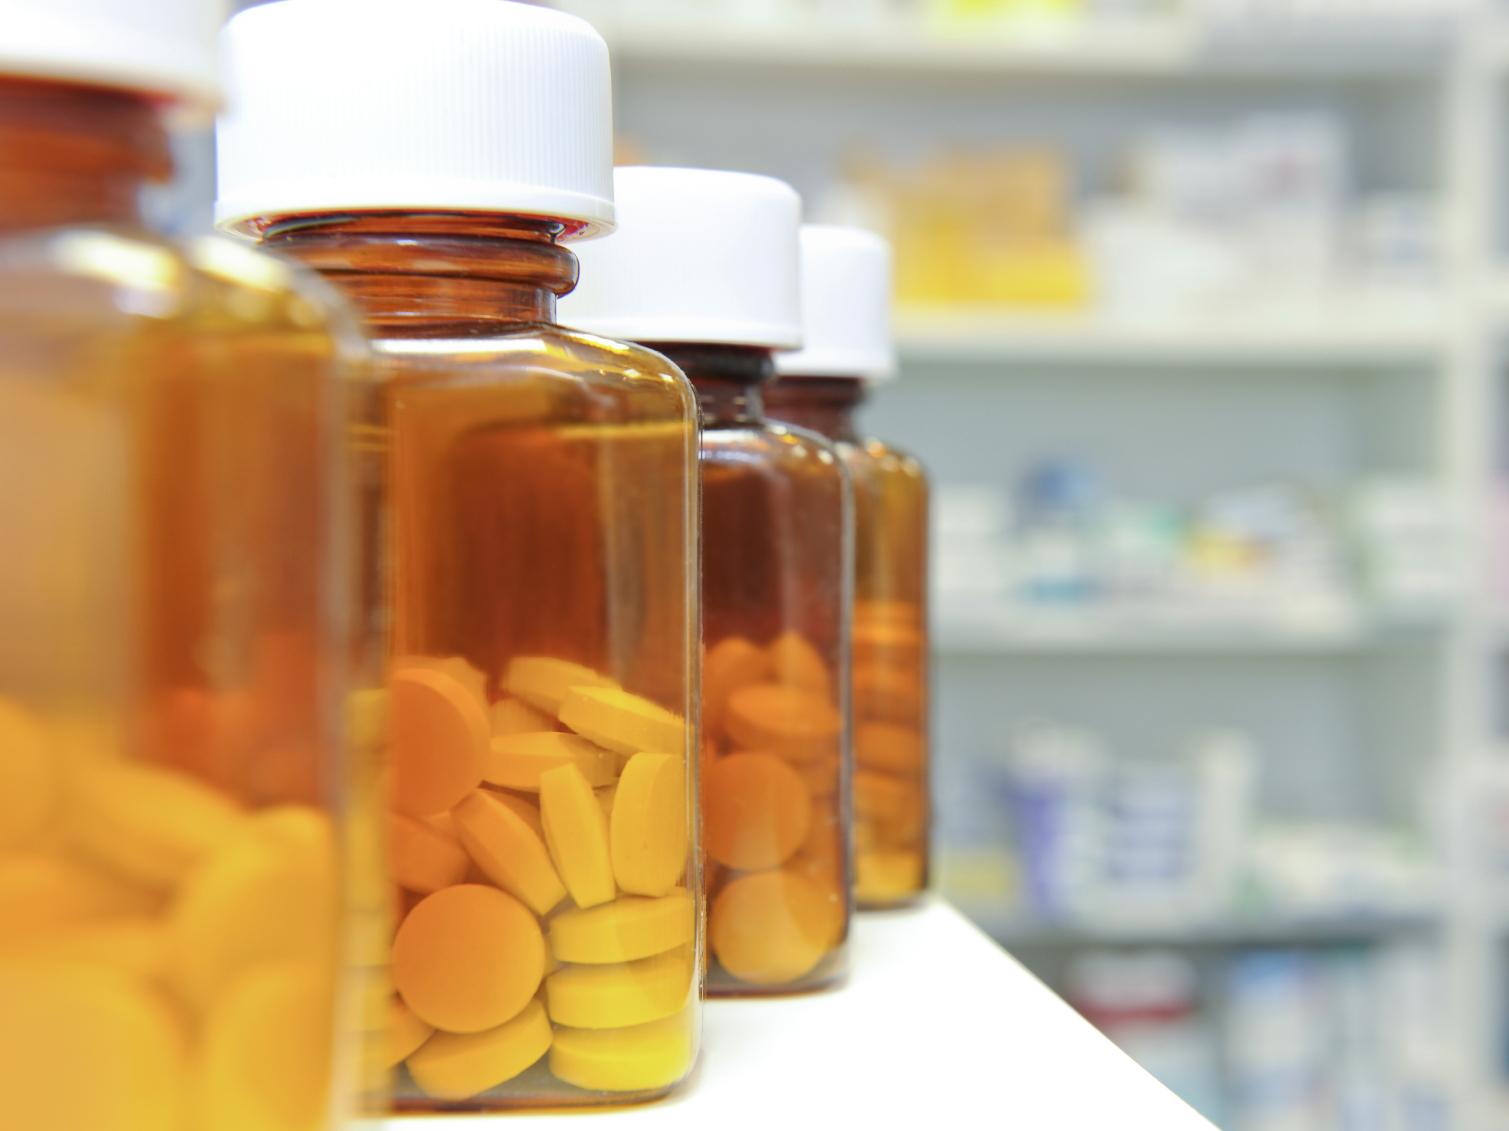 antibiotics online in uk for dogs